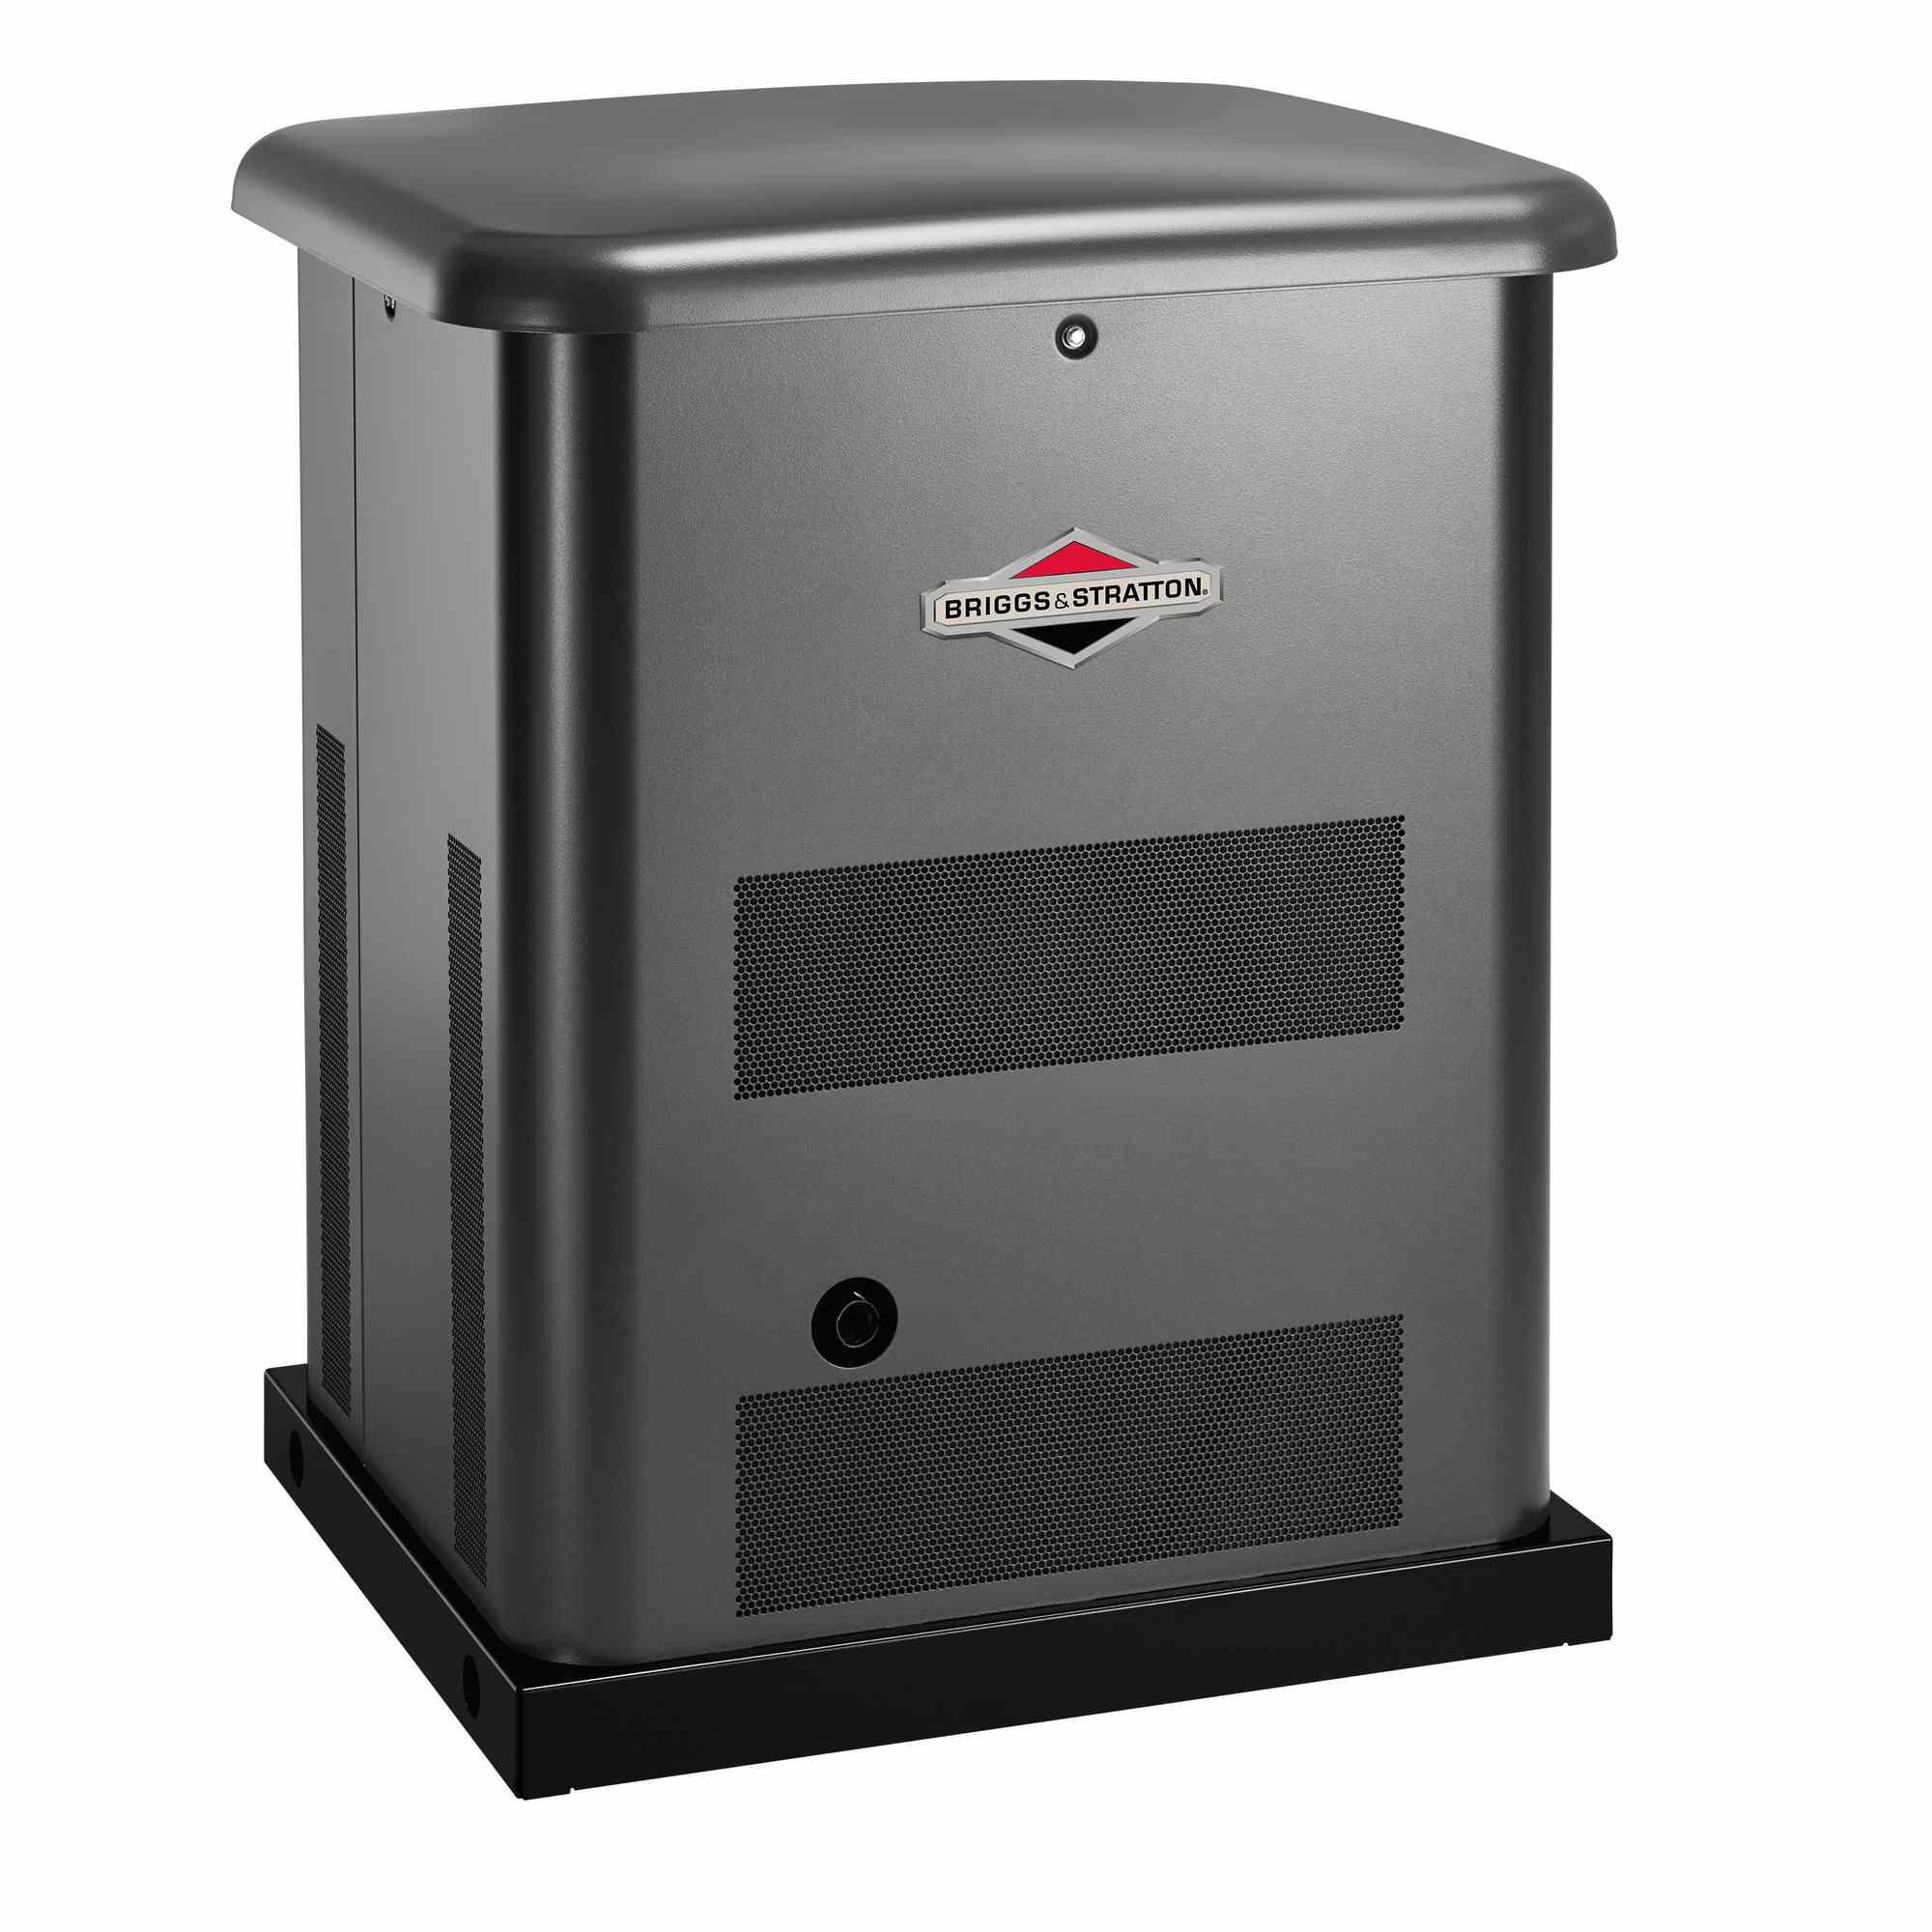 Briggs & Stratton 10 kW Automatic Home Standby Generator, Model 040375